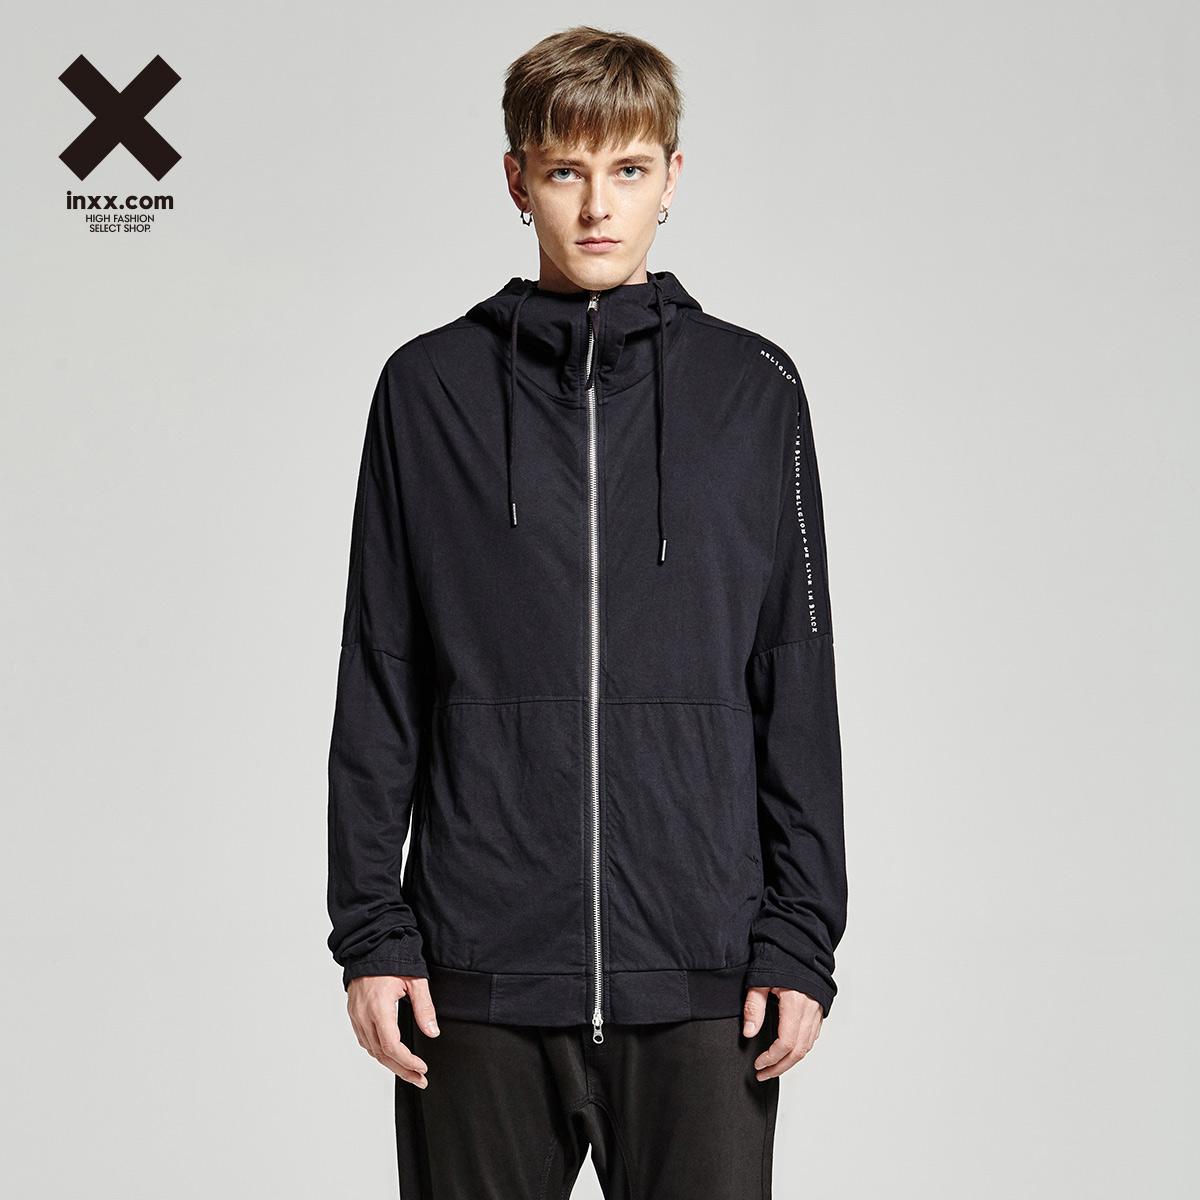 【INXX】Religion 冬季新品高街潮牌连帽卫衣男款上装RL53108053